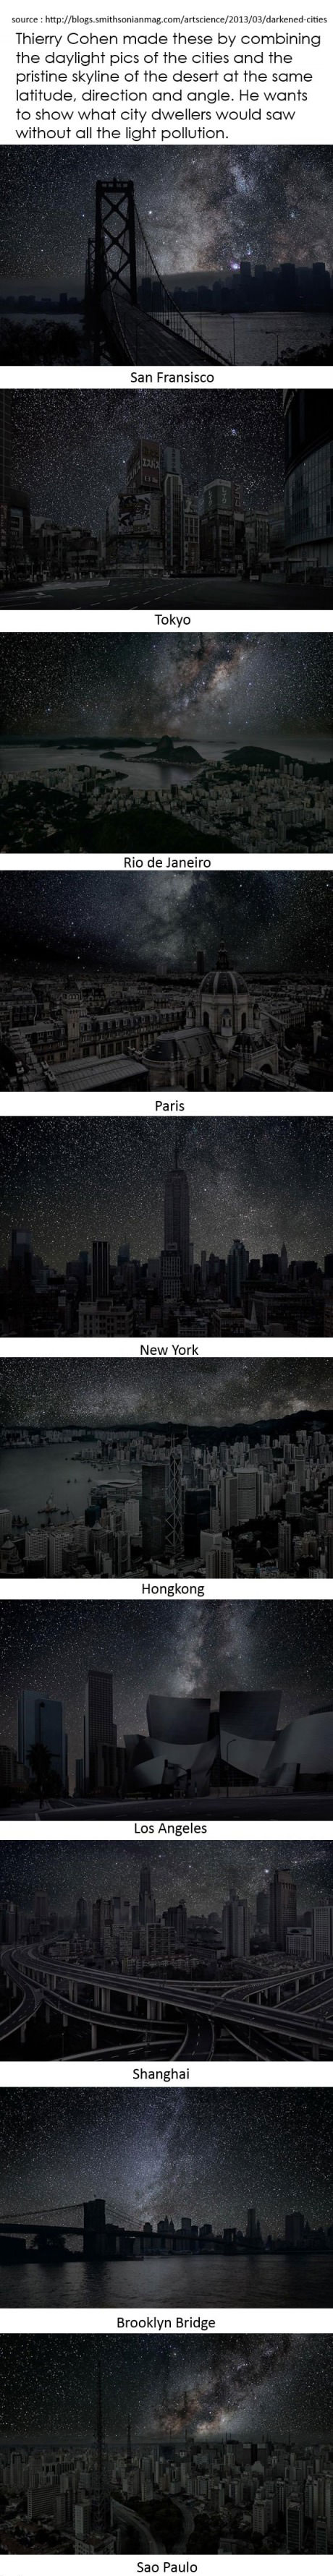 cities, art, light, pollution, sky, stars